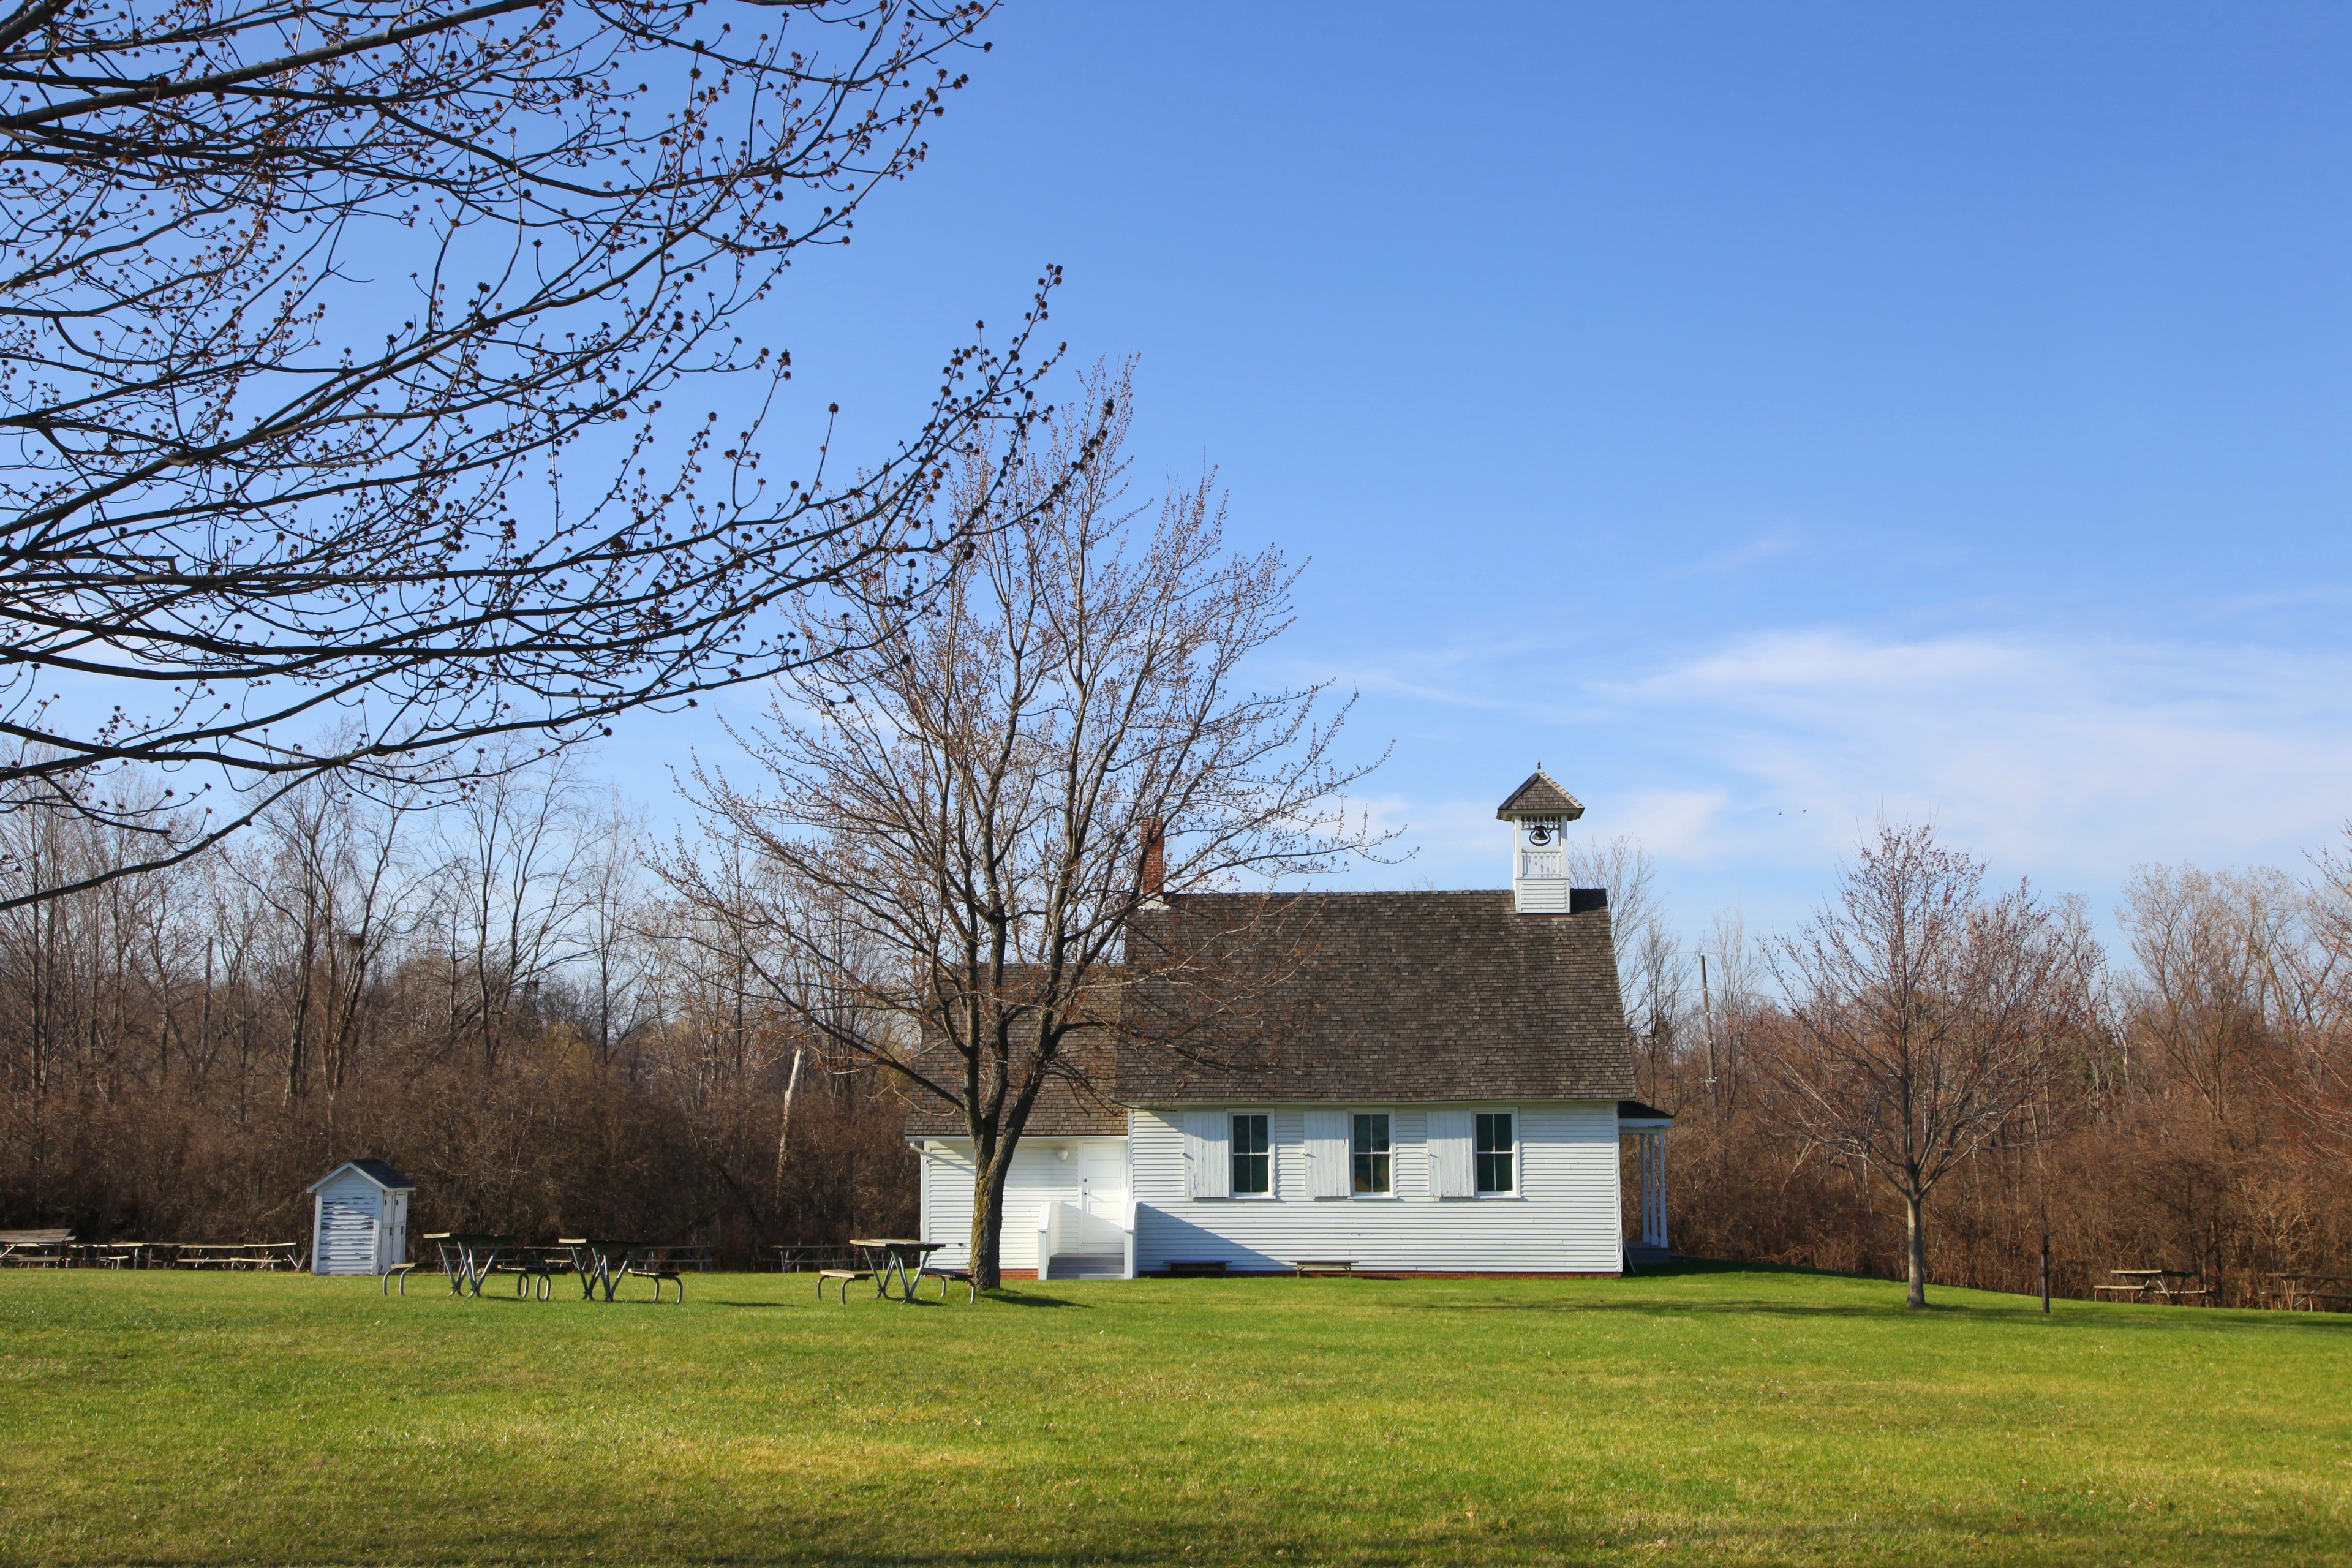 South Lyon, Michigan, United States of America